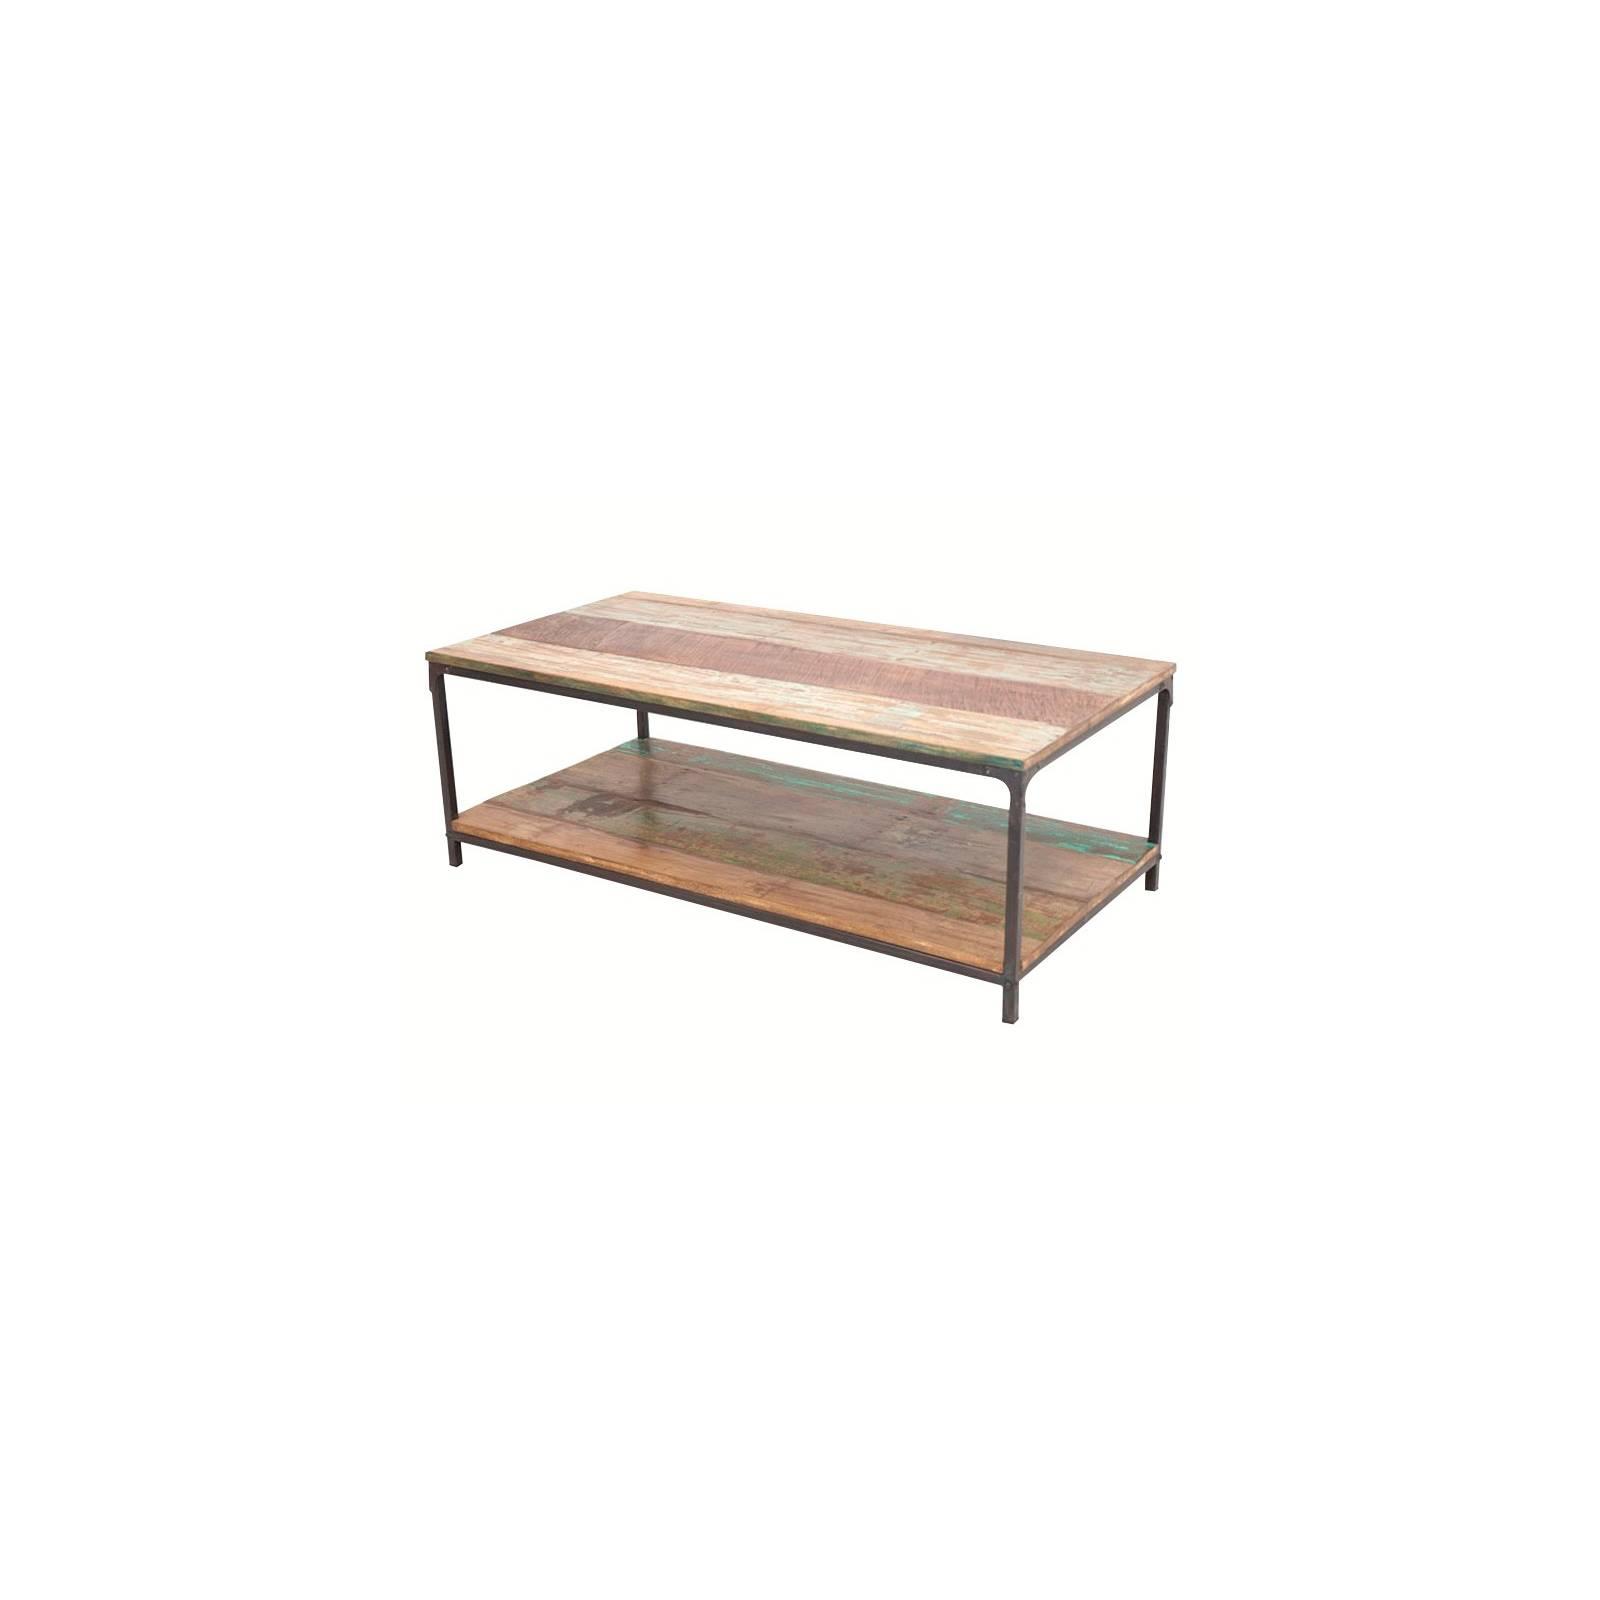 Table Basse Butterfly Palissandre - meuble industriel en bois exotique